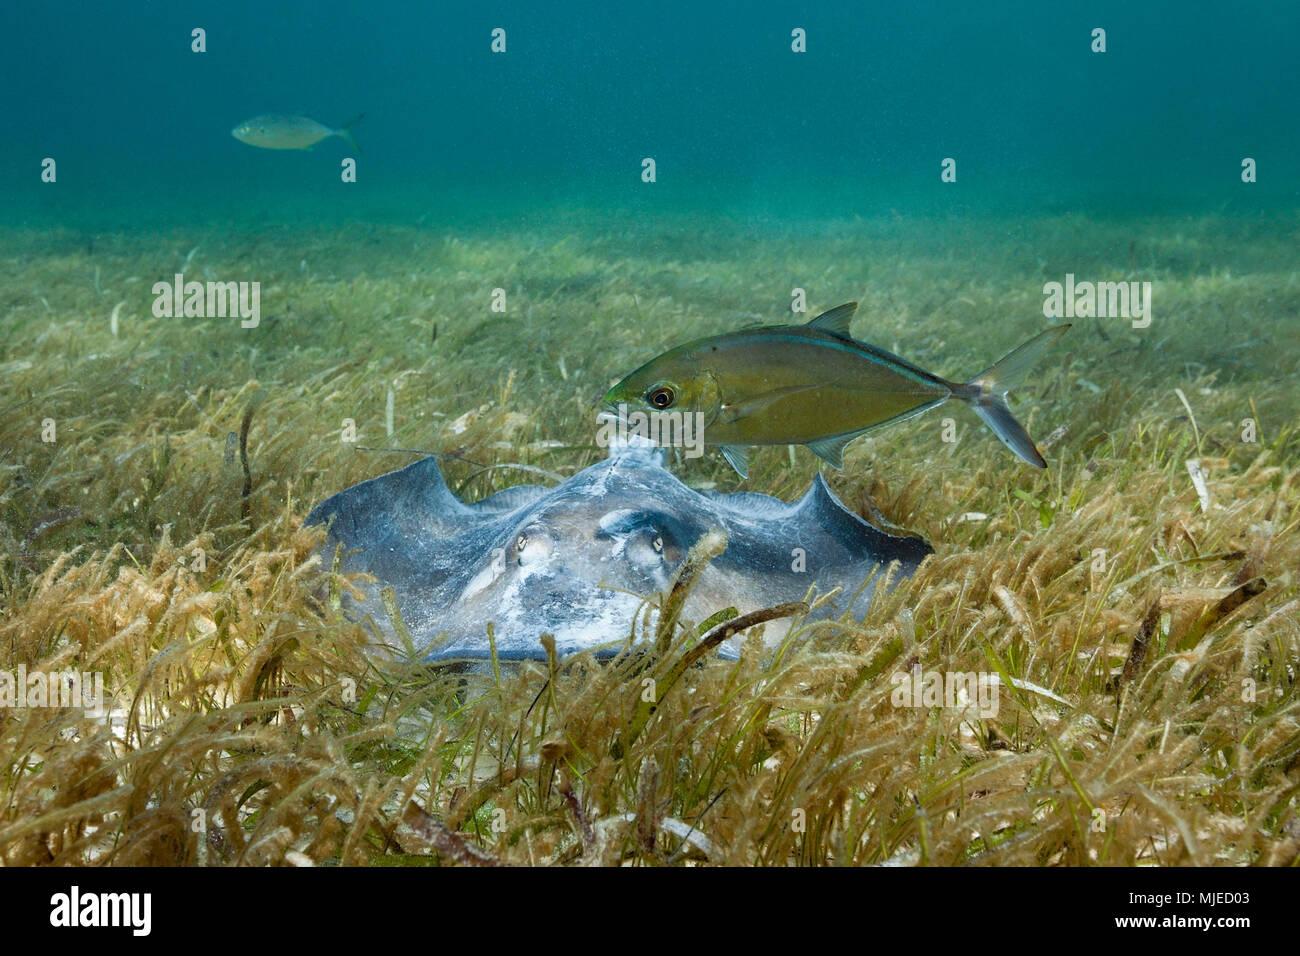 Southern Stingray on Seagrass, Dasyatis americana, Akumal, Tulum, Mexico - Stock Image